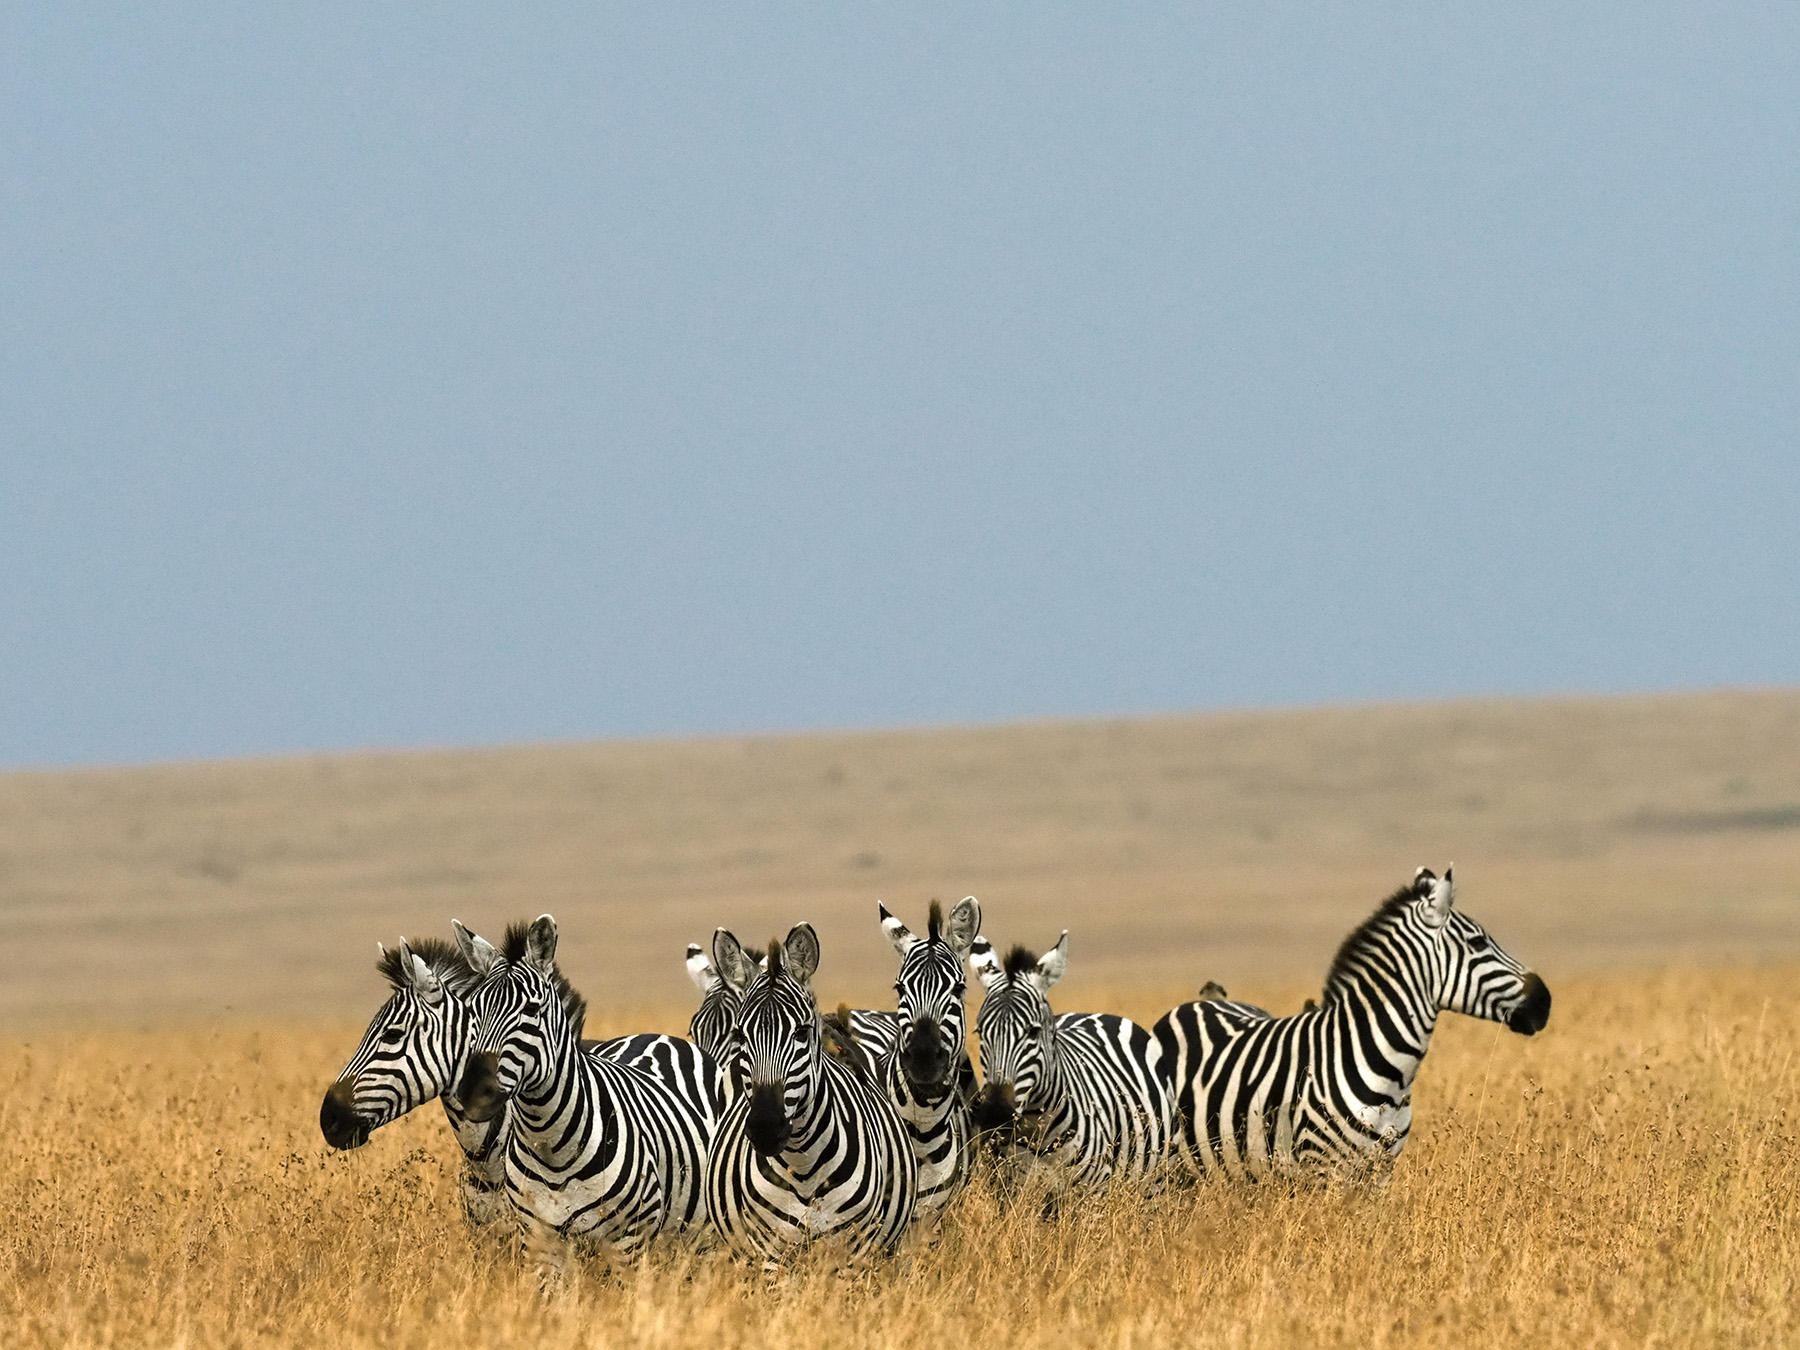 Ranjan_Ramchandani_Zebras in a bunch.jpg